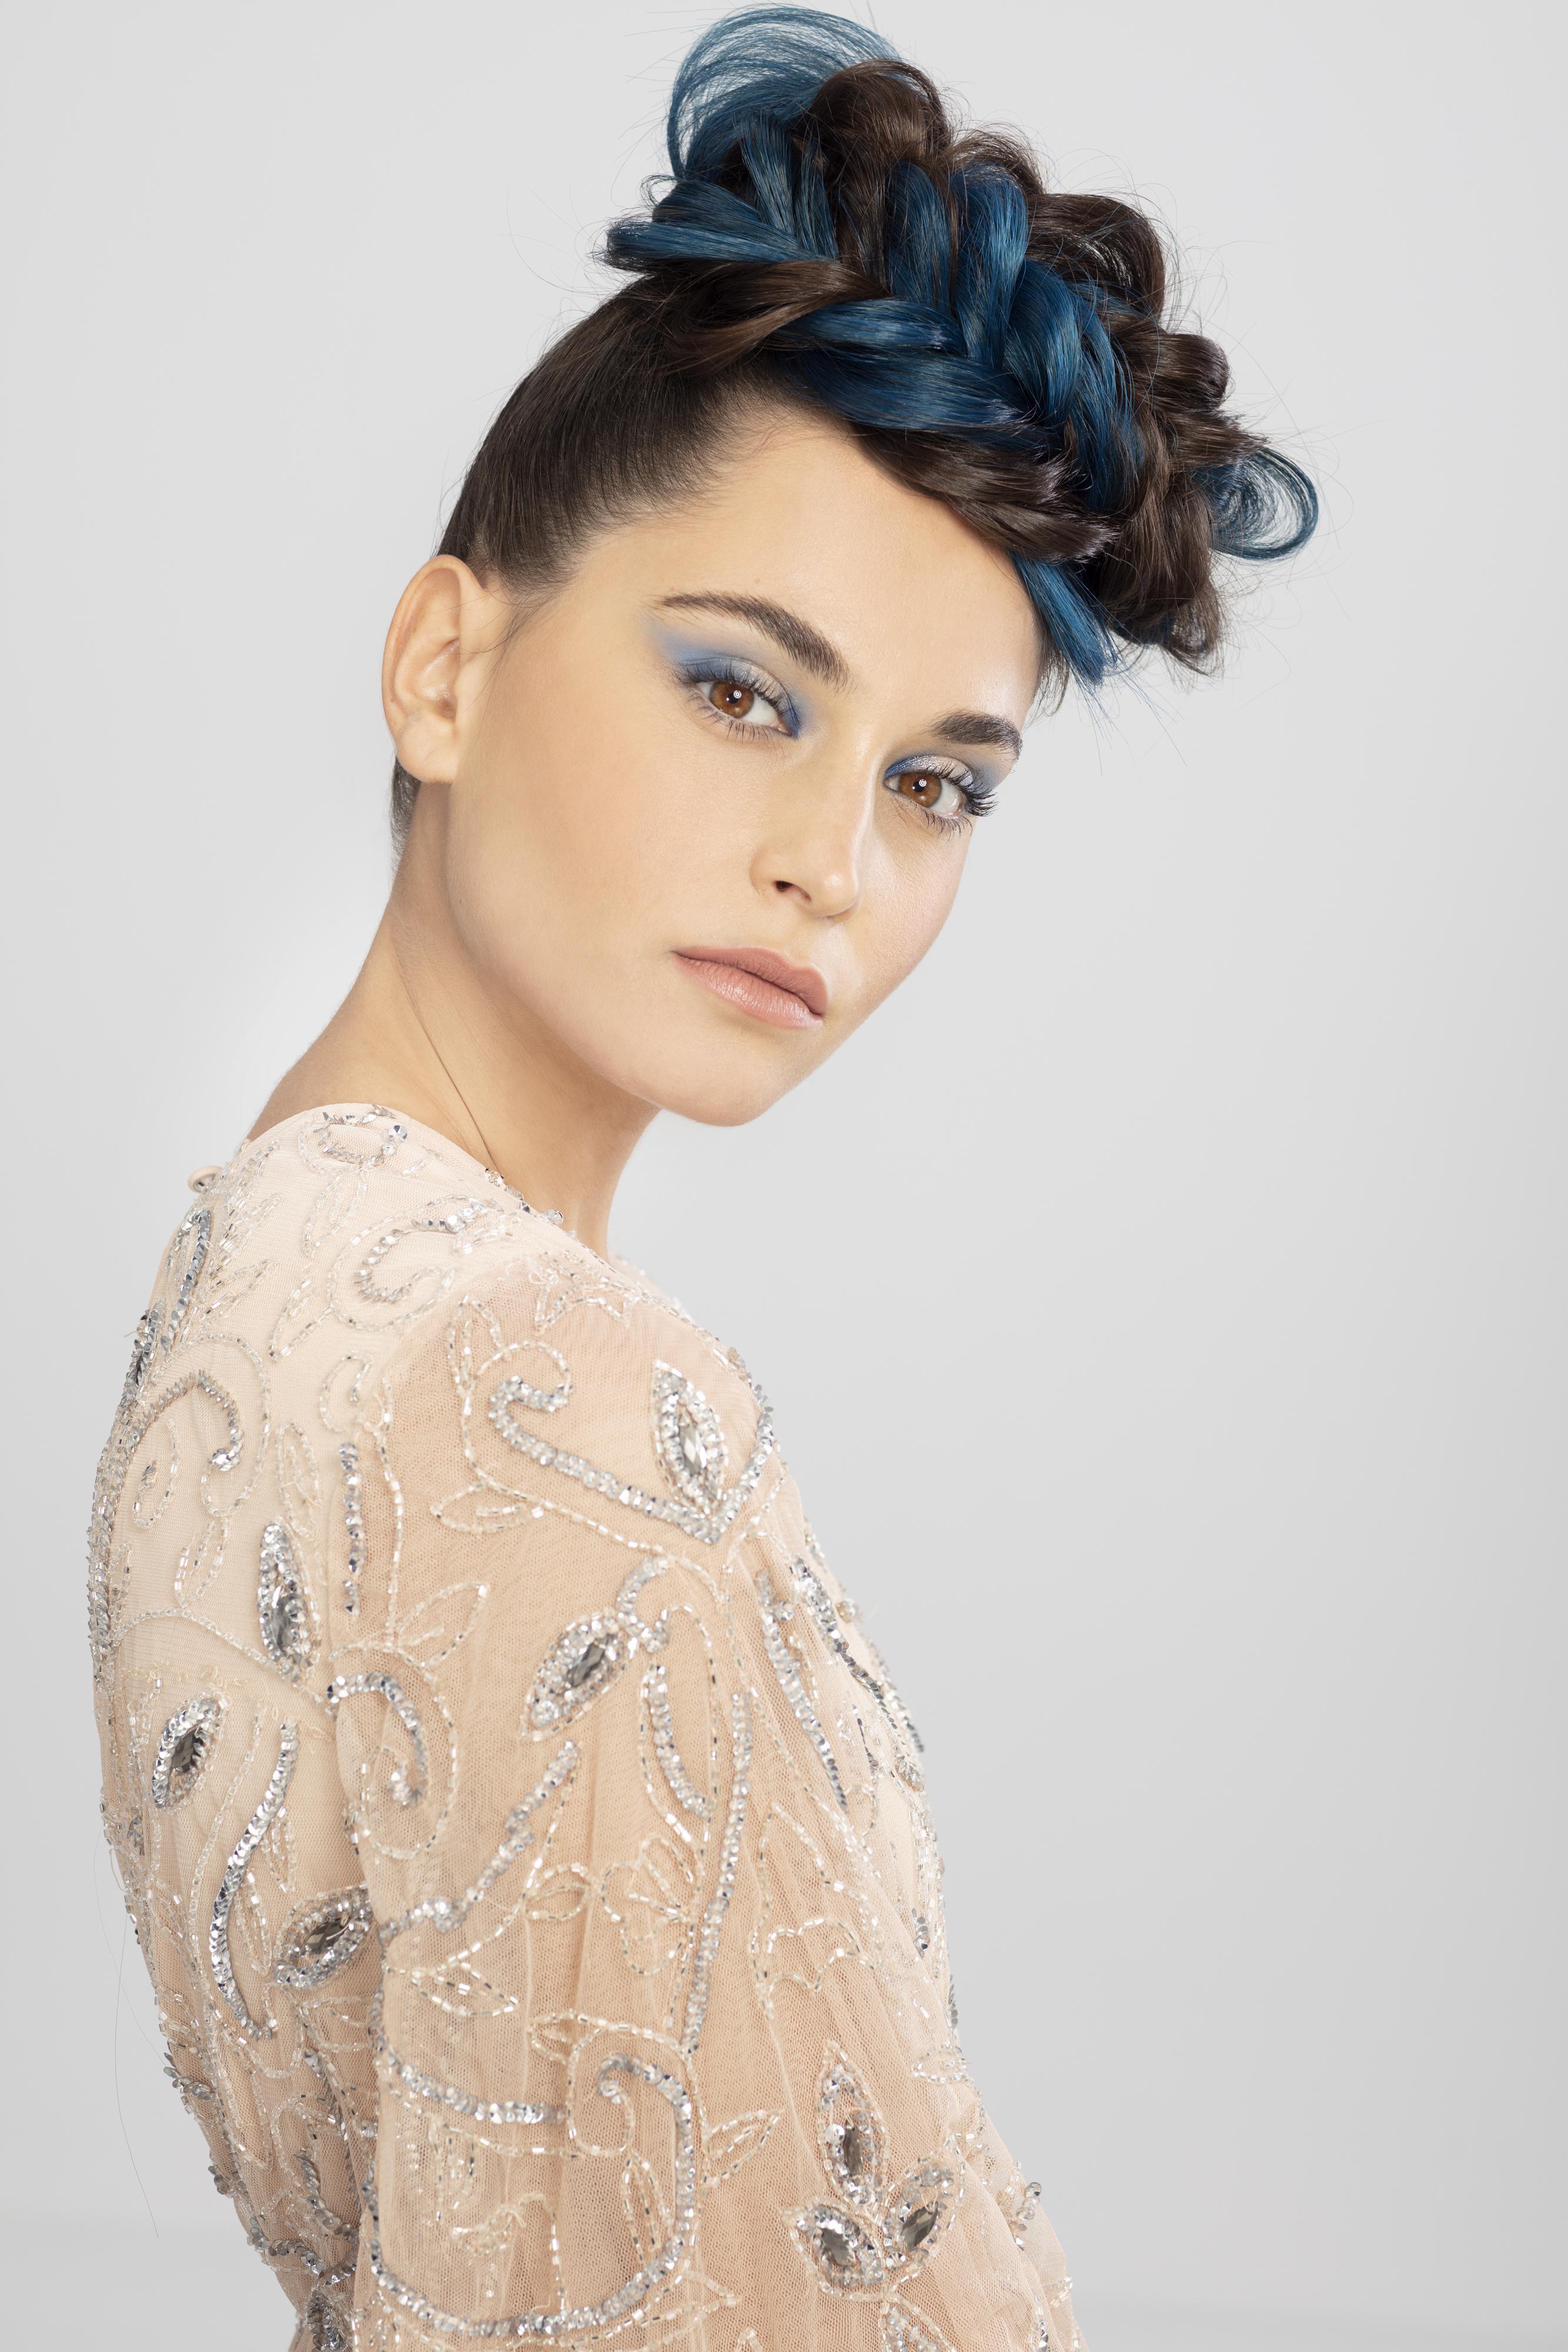 Direction artistique et coiffure : David Baehr, maquillage : Pauline Hauck, photos : Styl'List Images